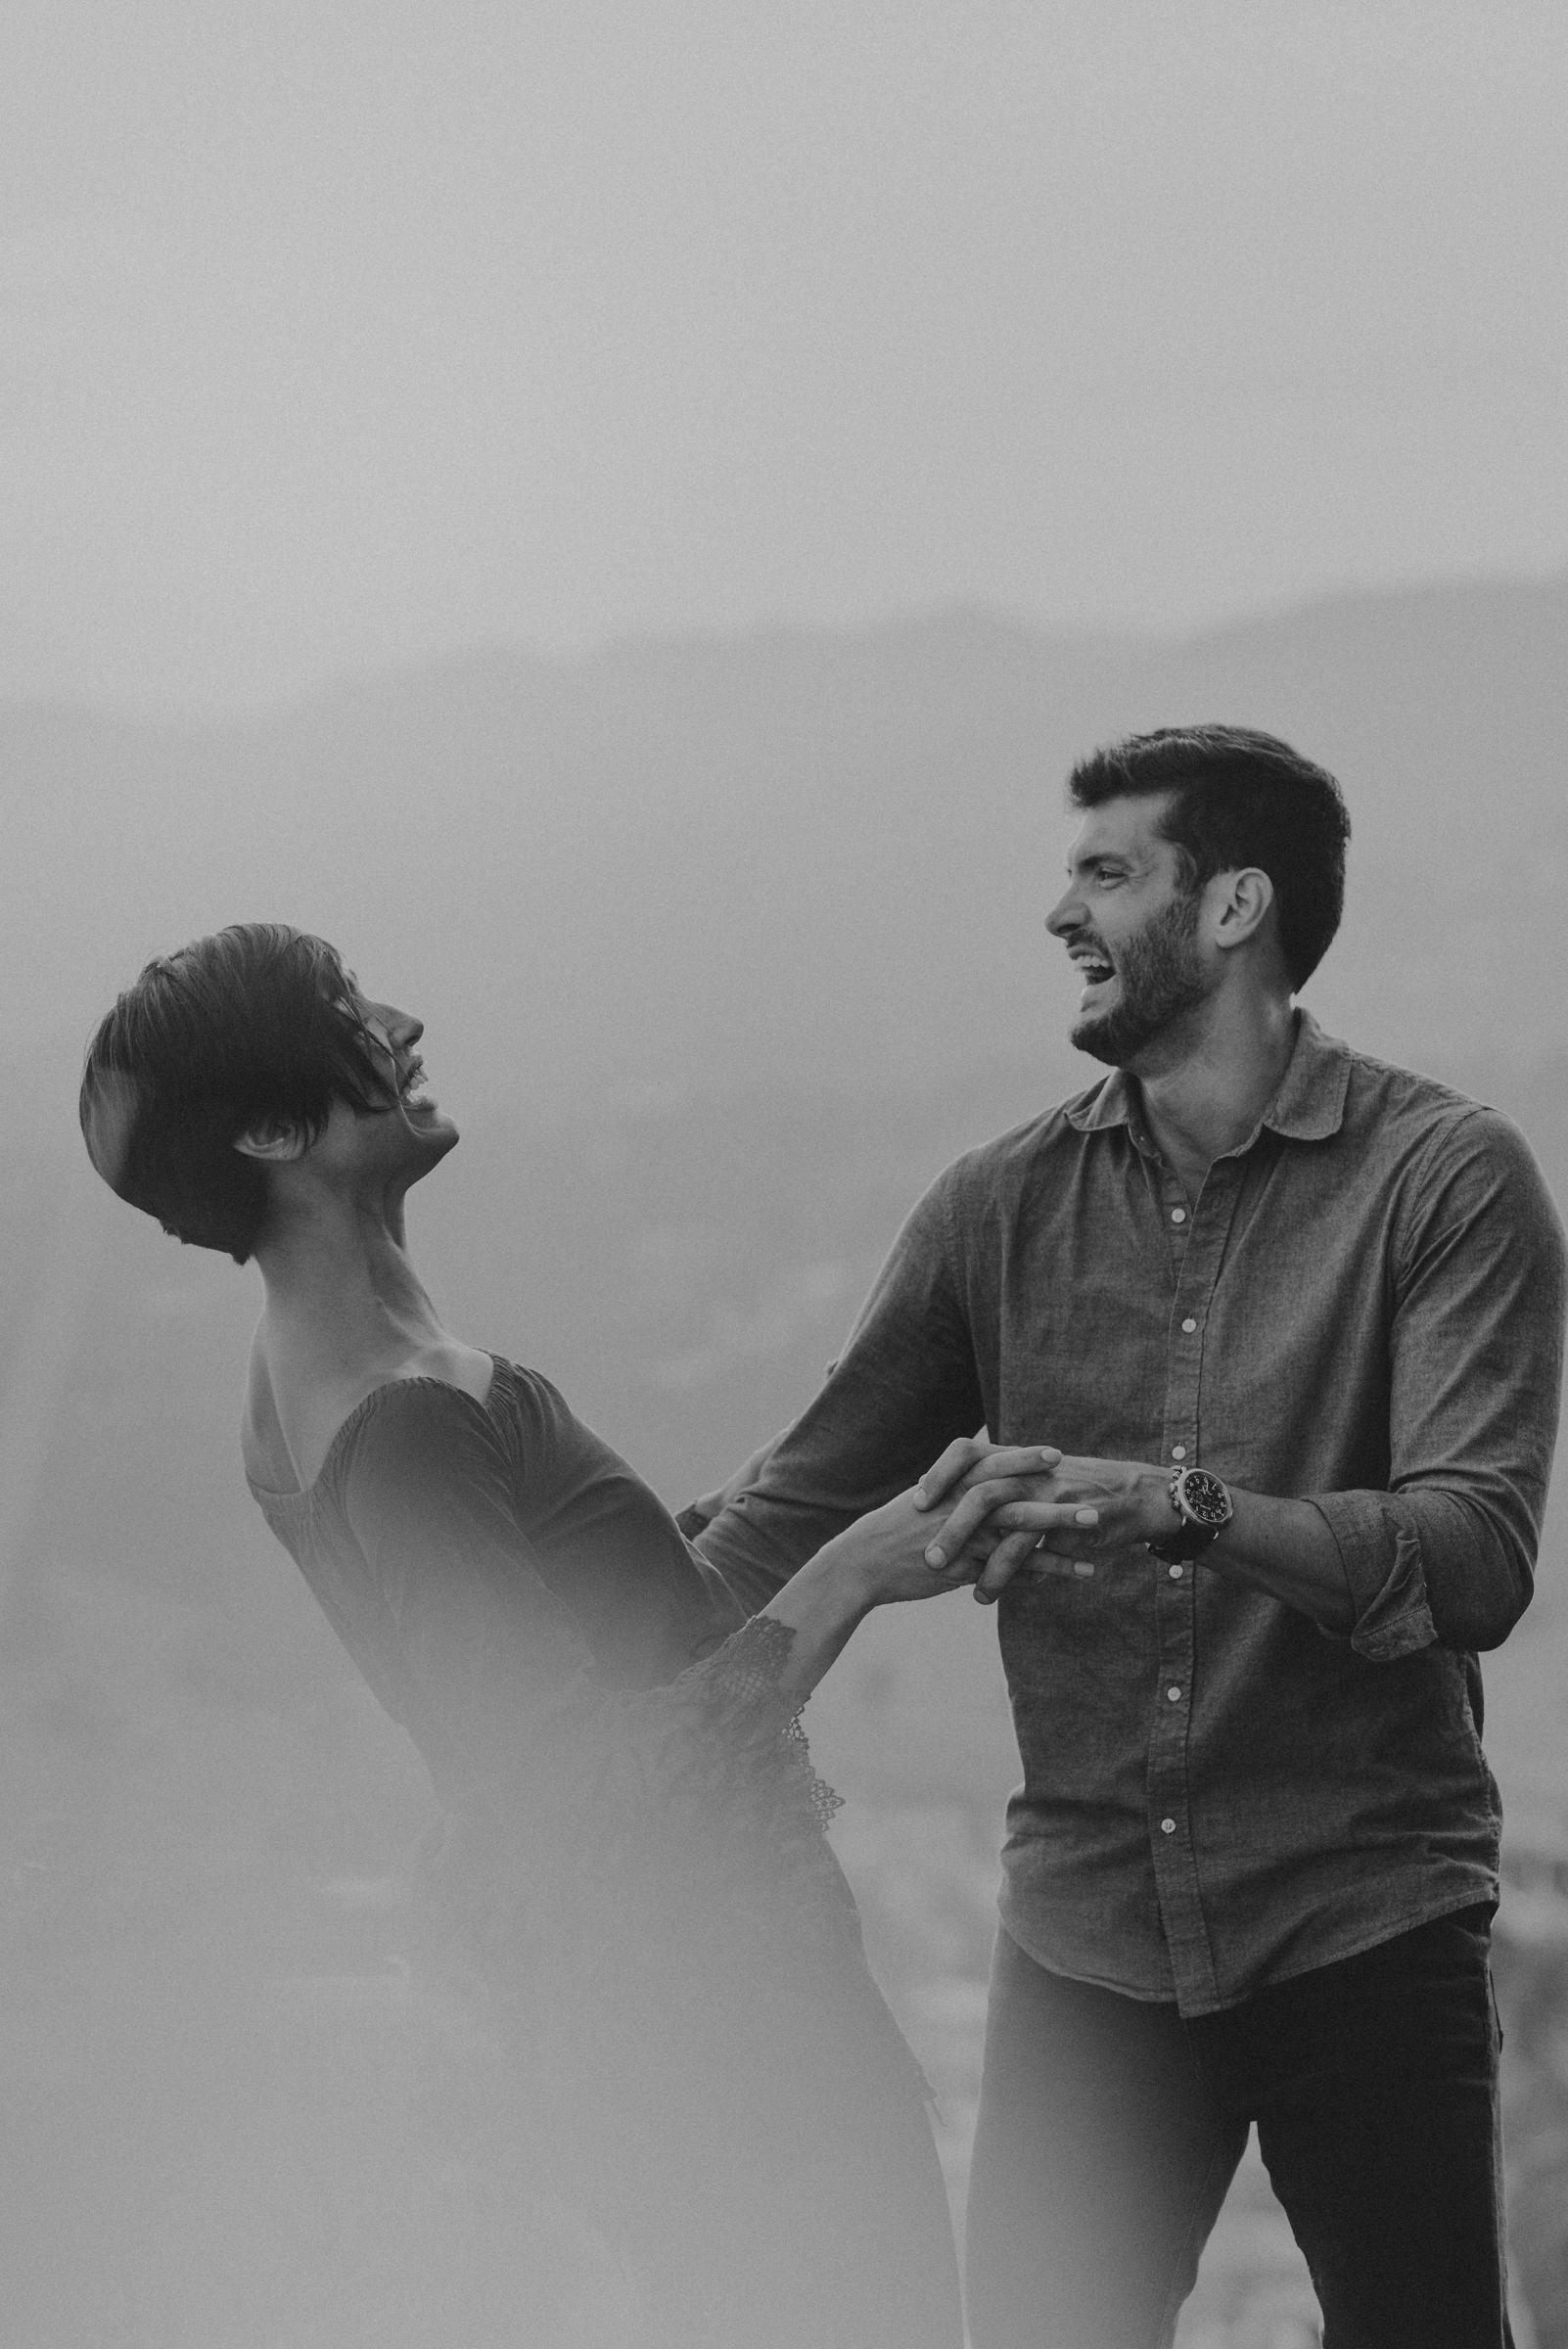 Isaiah + Taylor Photography - Santa Monica Engagement Session, Los Angeles Wedding Photographer-039.jpg